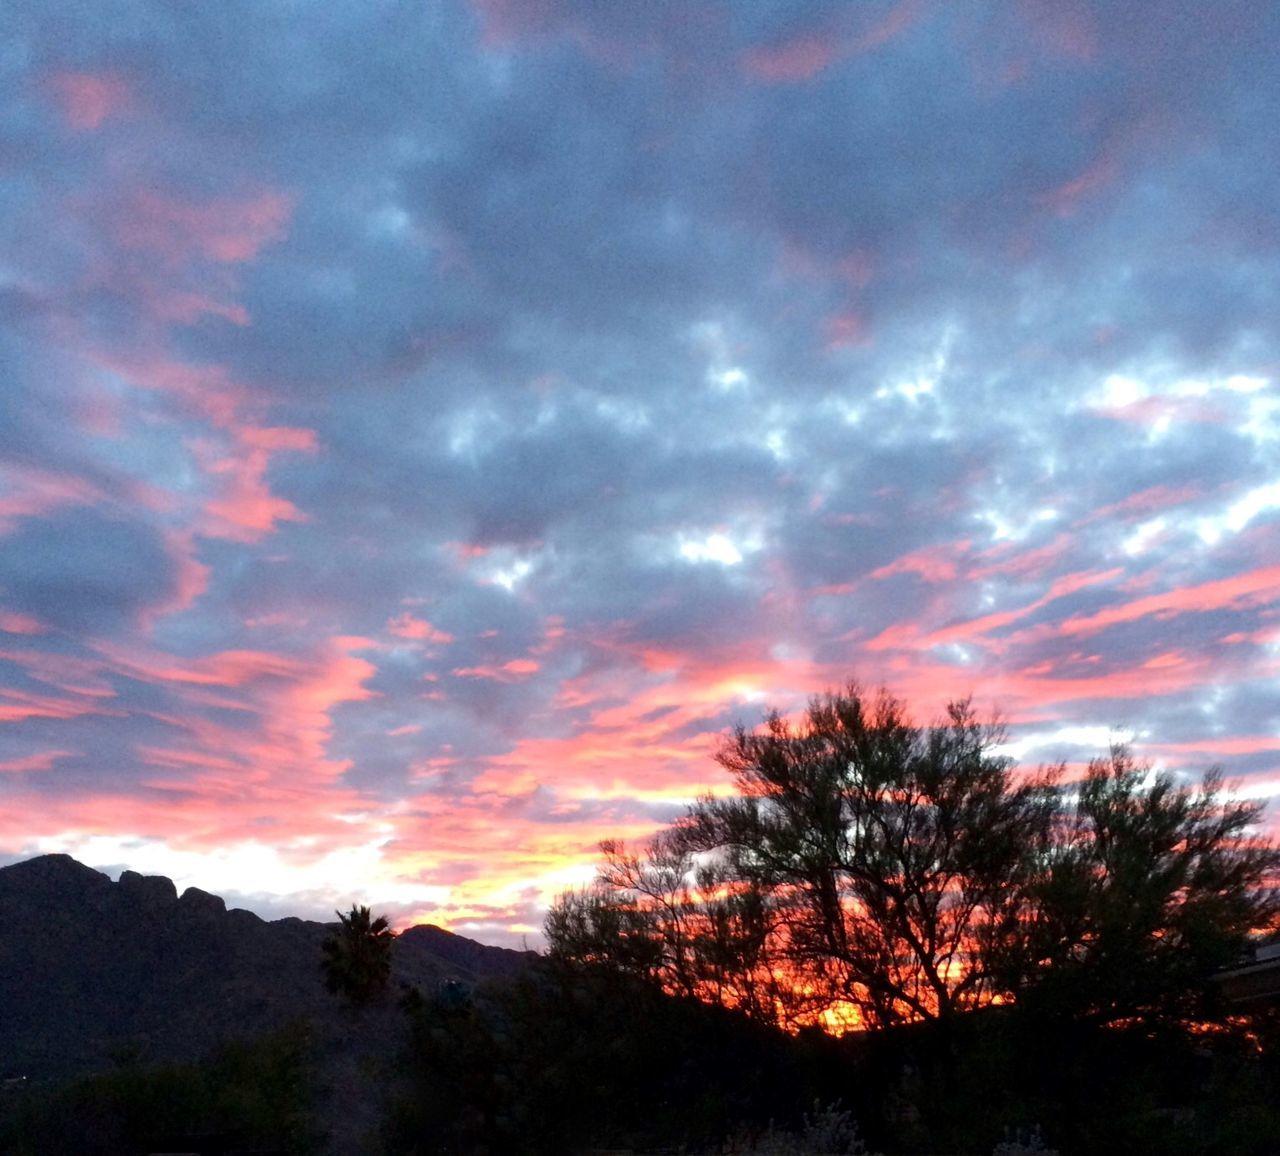 Dramatic Arizona sunset Beauty In Nature Cloud Cloud - Sky Cloudy Dramatic Sky Dusk Idyllic Landscape Mountain Nature Non-urban Scene Orange Color Scenics Silhouette Sky Sunset Tranquil Scene Tranquility Tree Tree Silhouette Weather